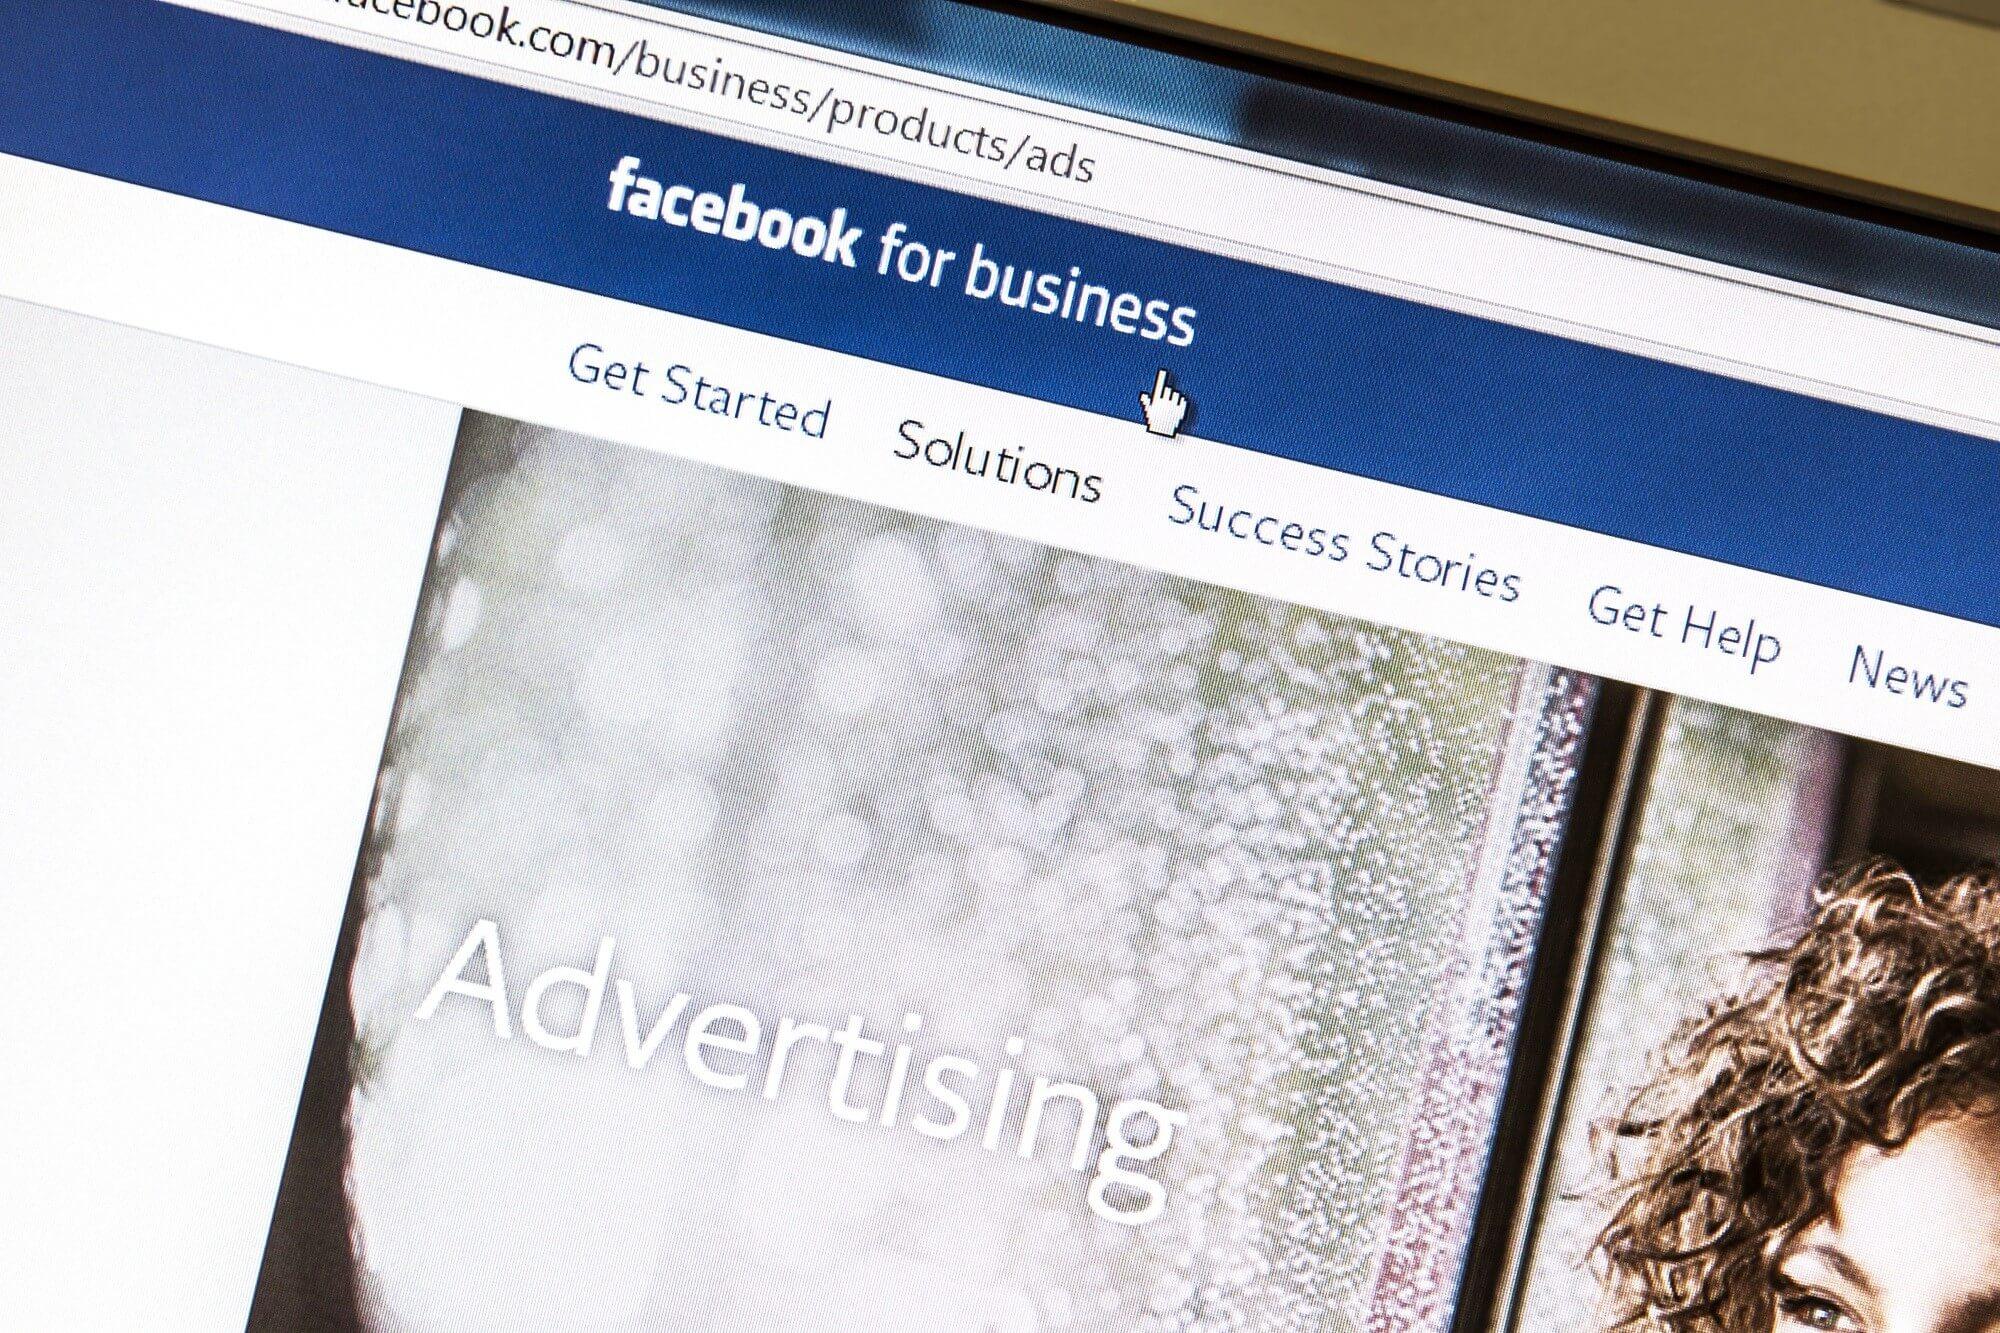 Facebook Local Awareness Ads & Their Benefits